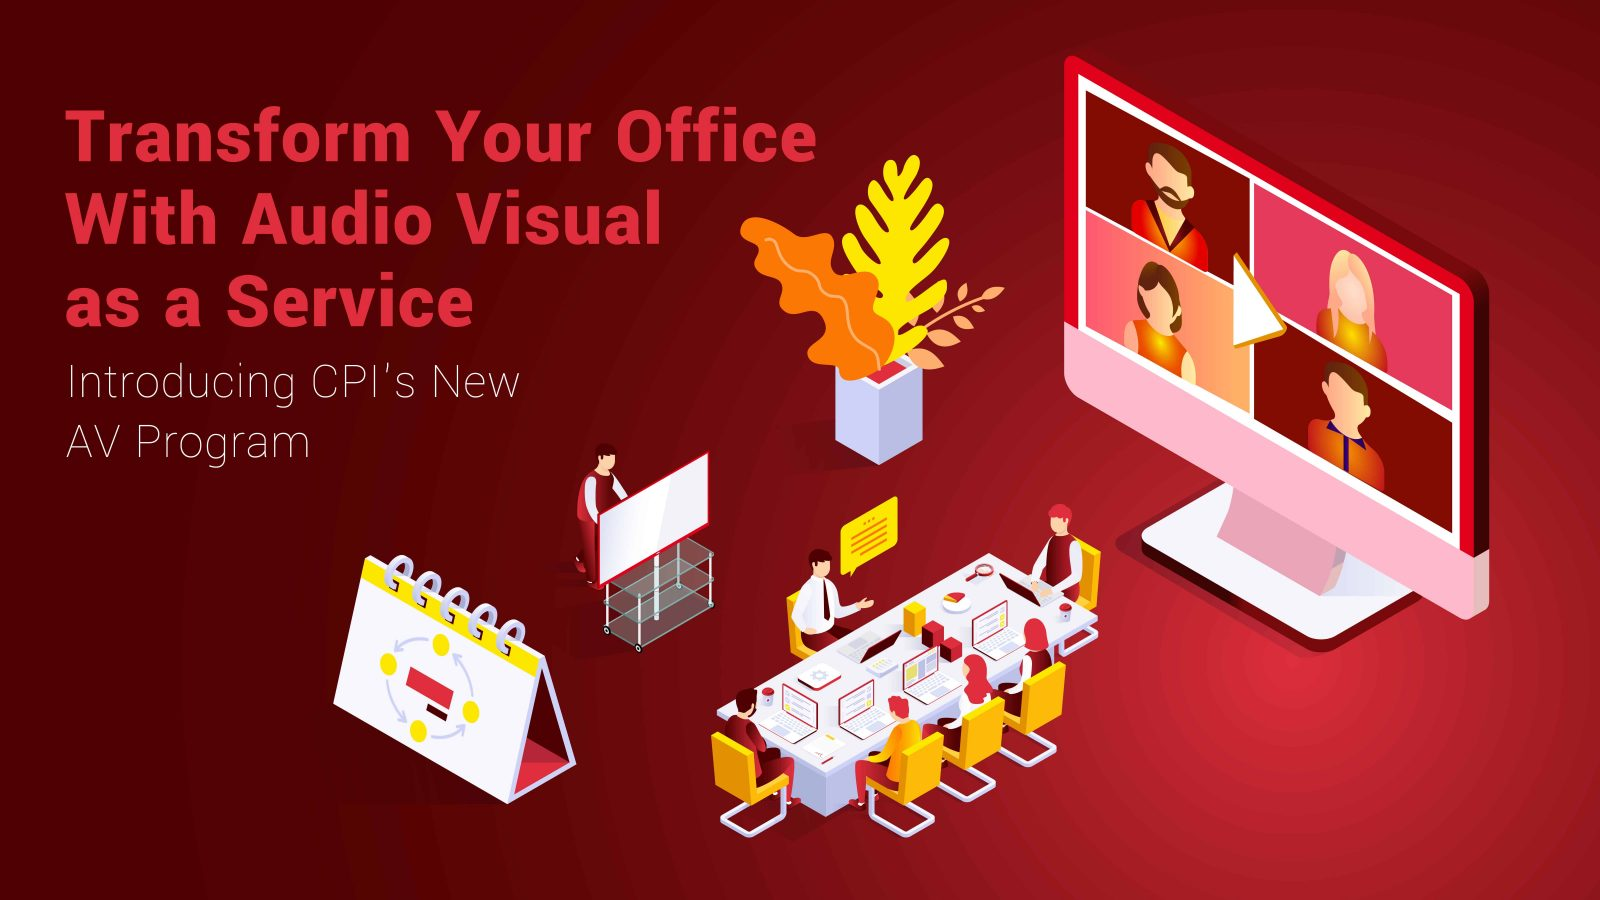 Audio Visual as a Service